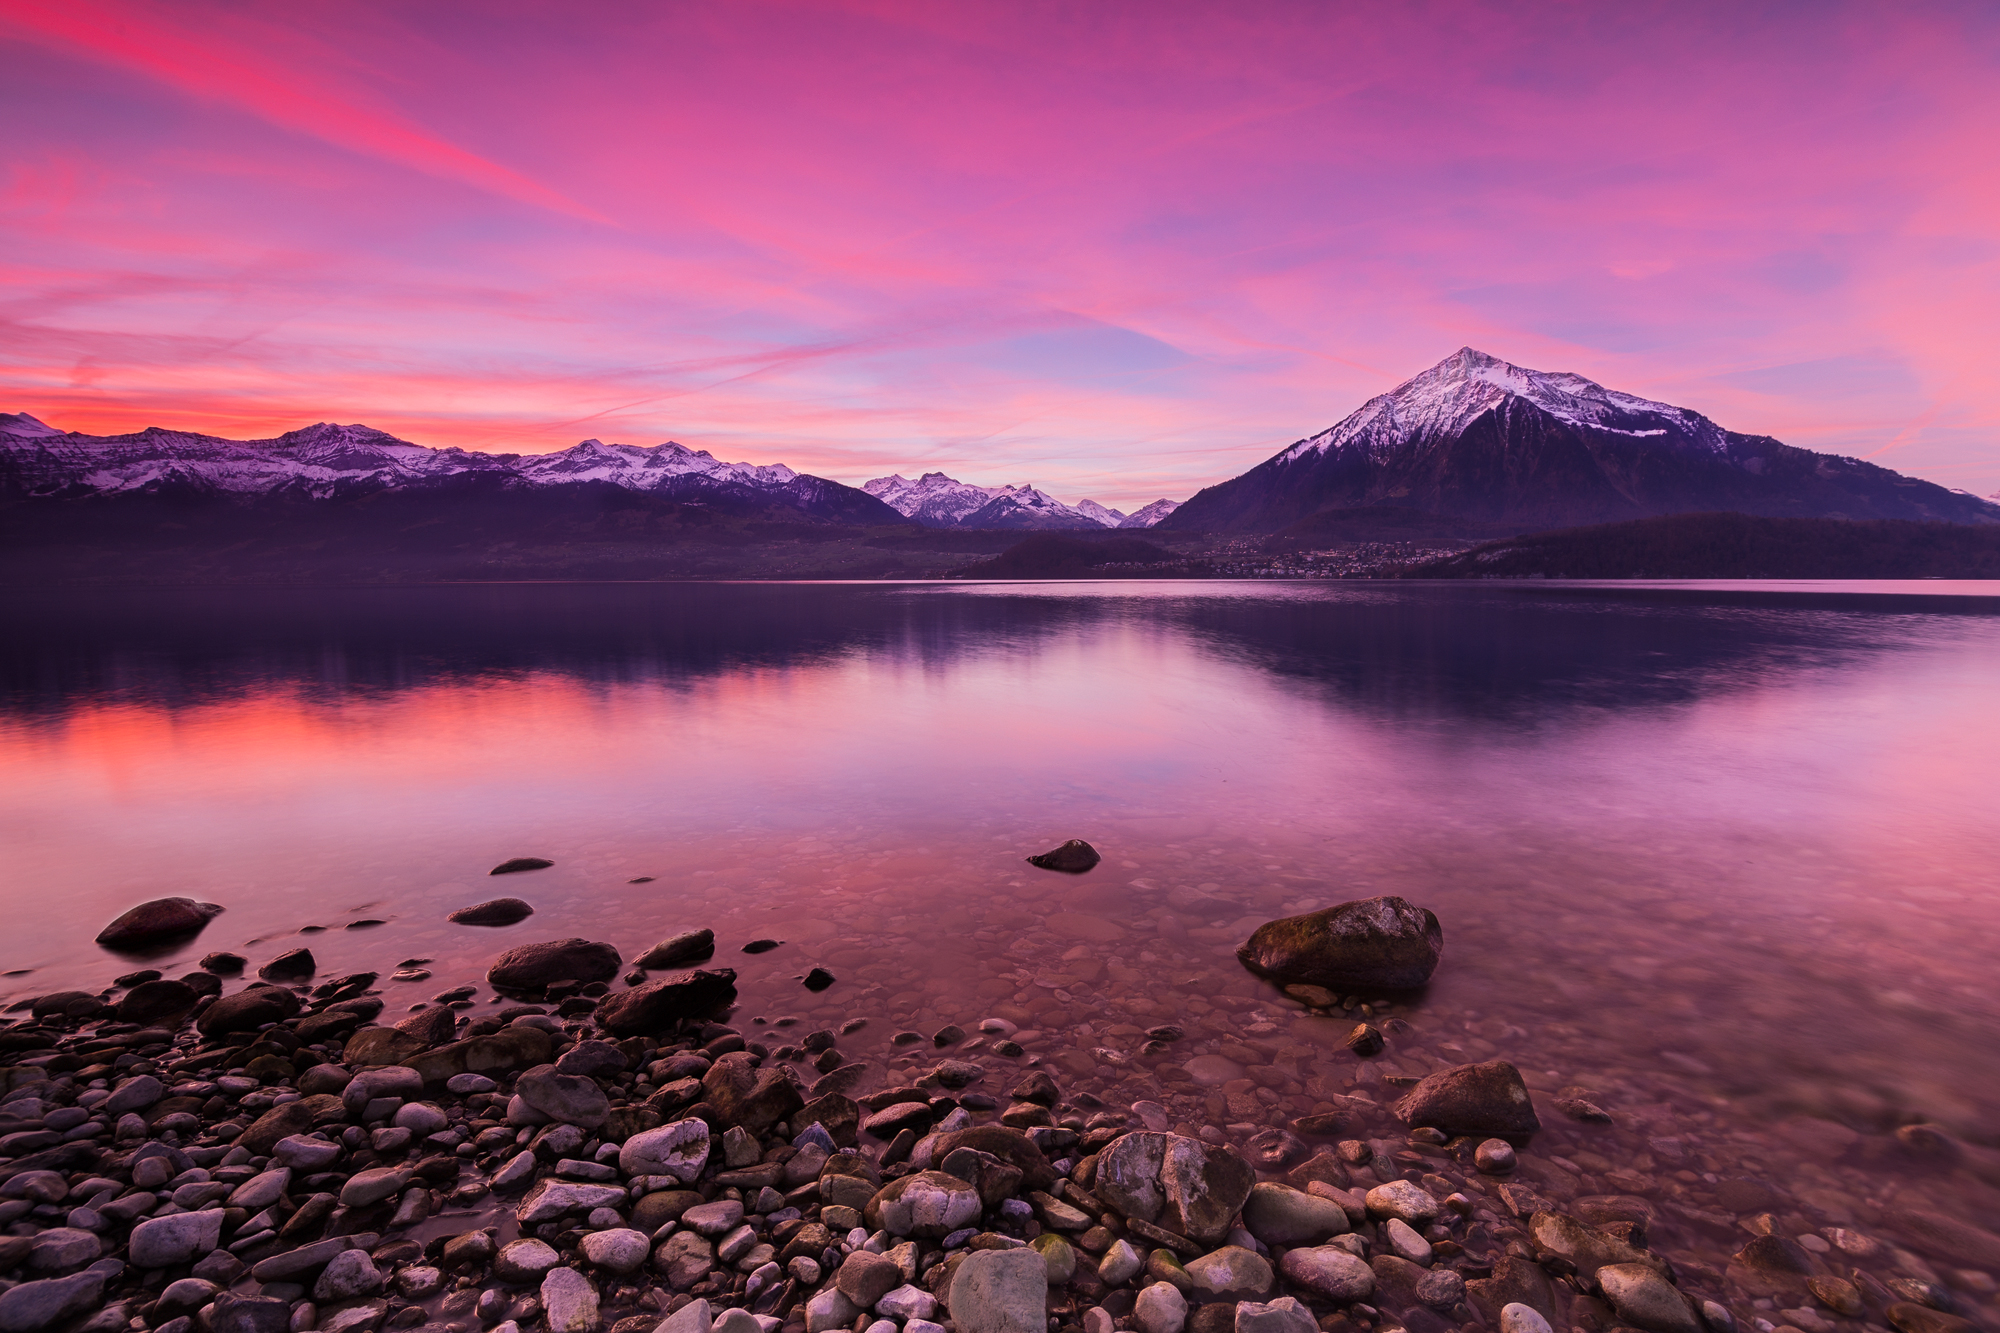 Lakeview, Switzerland